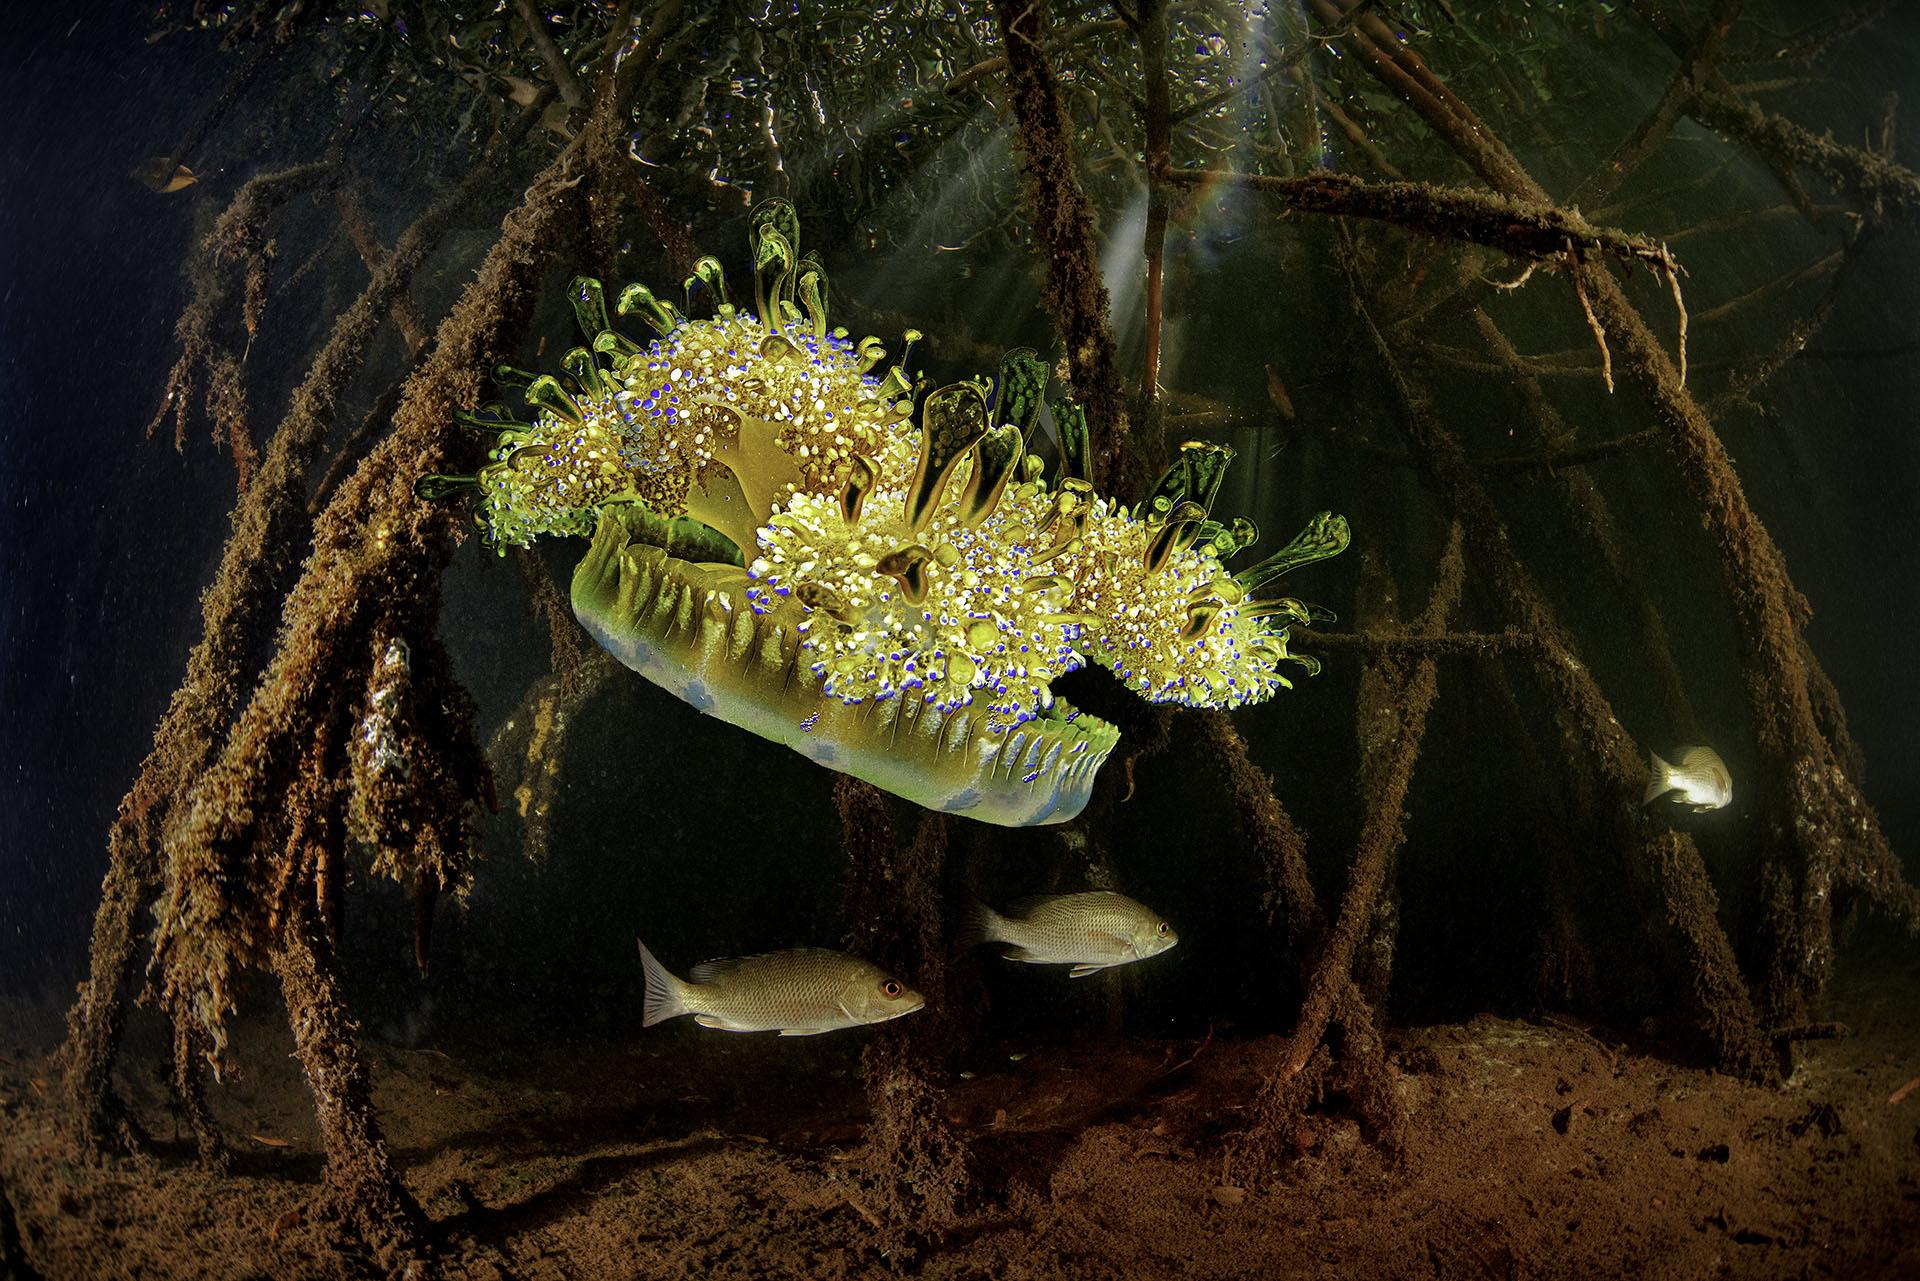 Upside down Jellyfish in the Mangrove - Loreno Mittiga, Netherlands Antilles